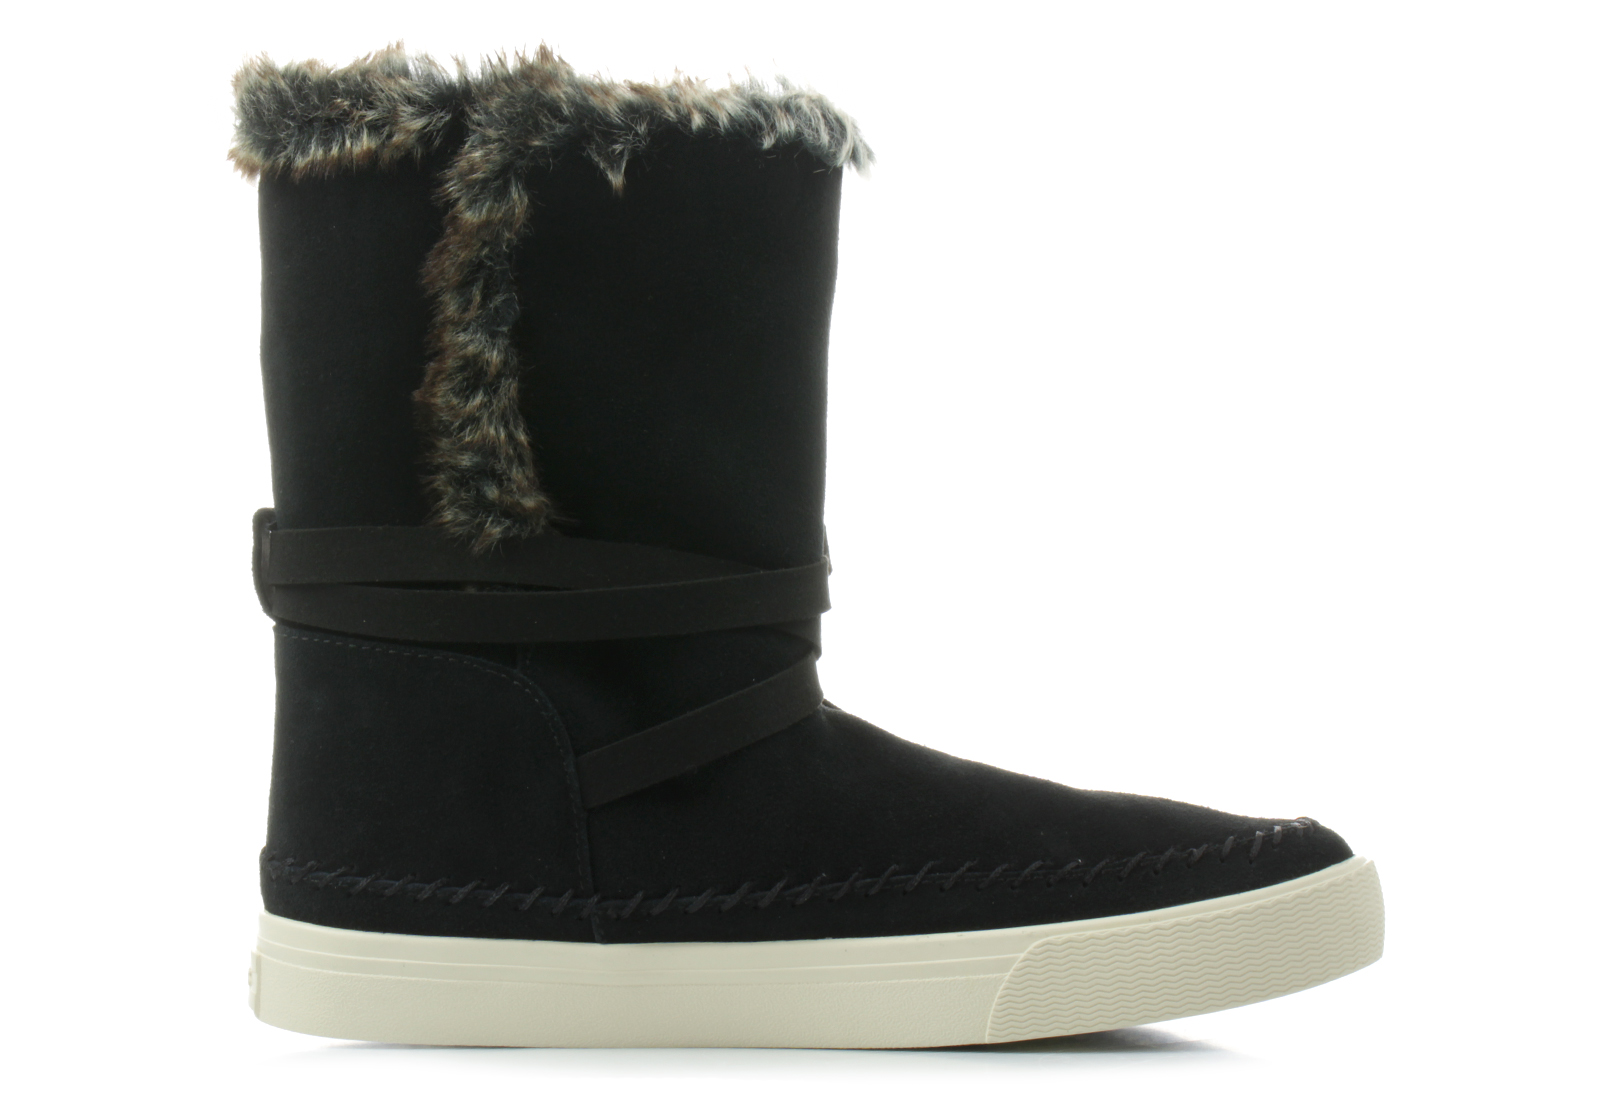 toms boots vista boot 10010901 blk shop for